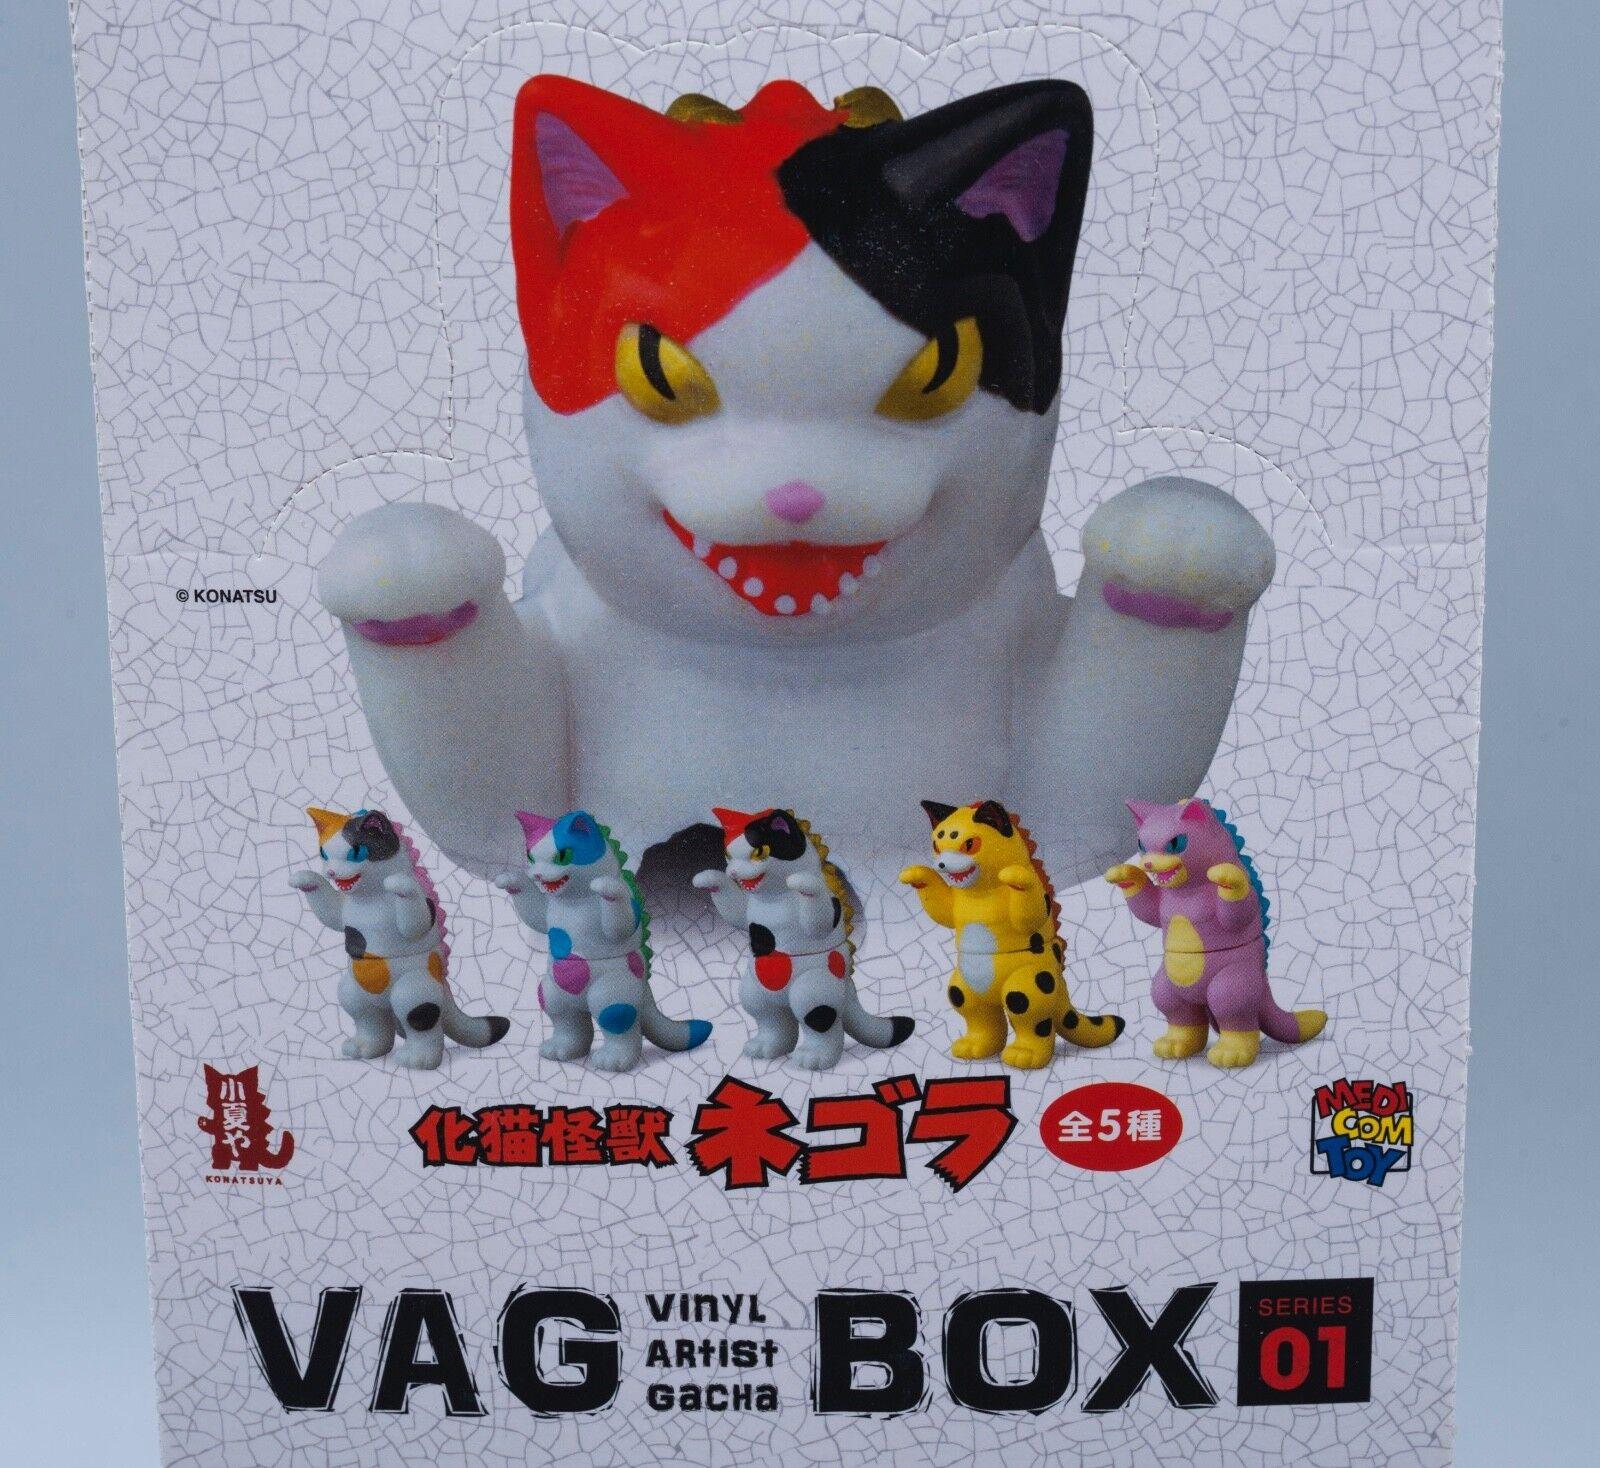 Kaiju negora VAG specialeeE in VINILE artista Gacha Set Completo konatsuya MEDICOM Konatsu